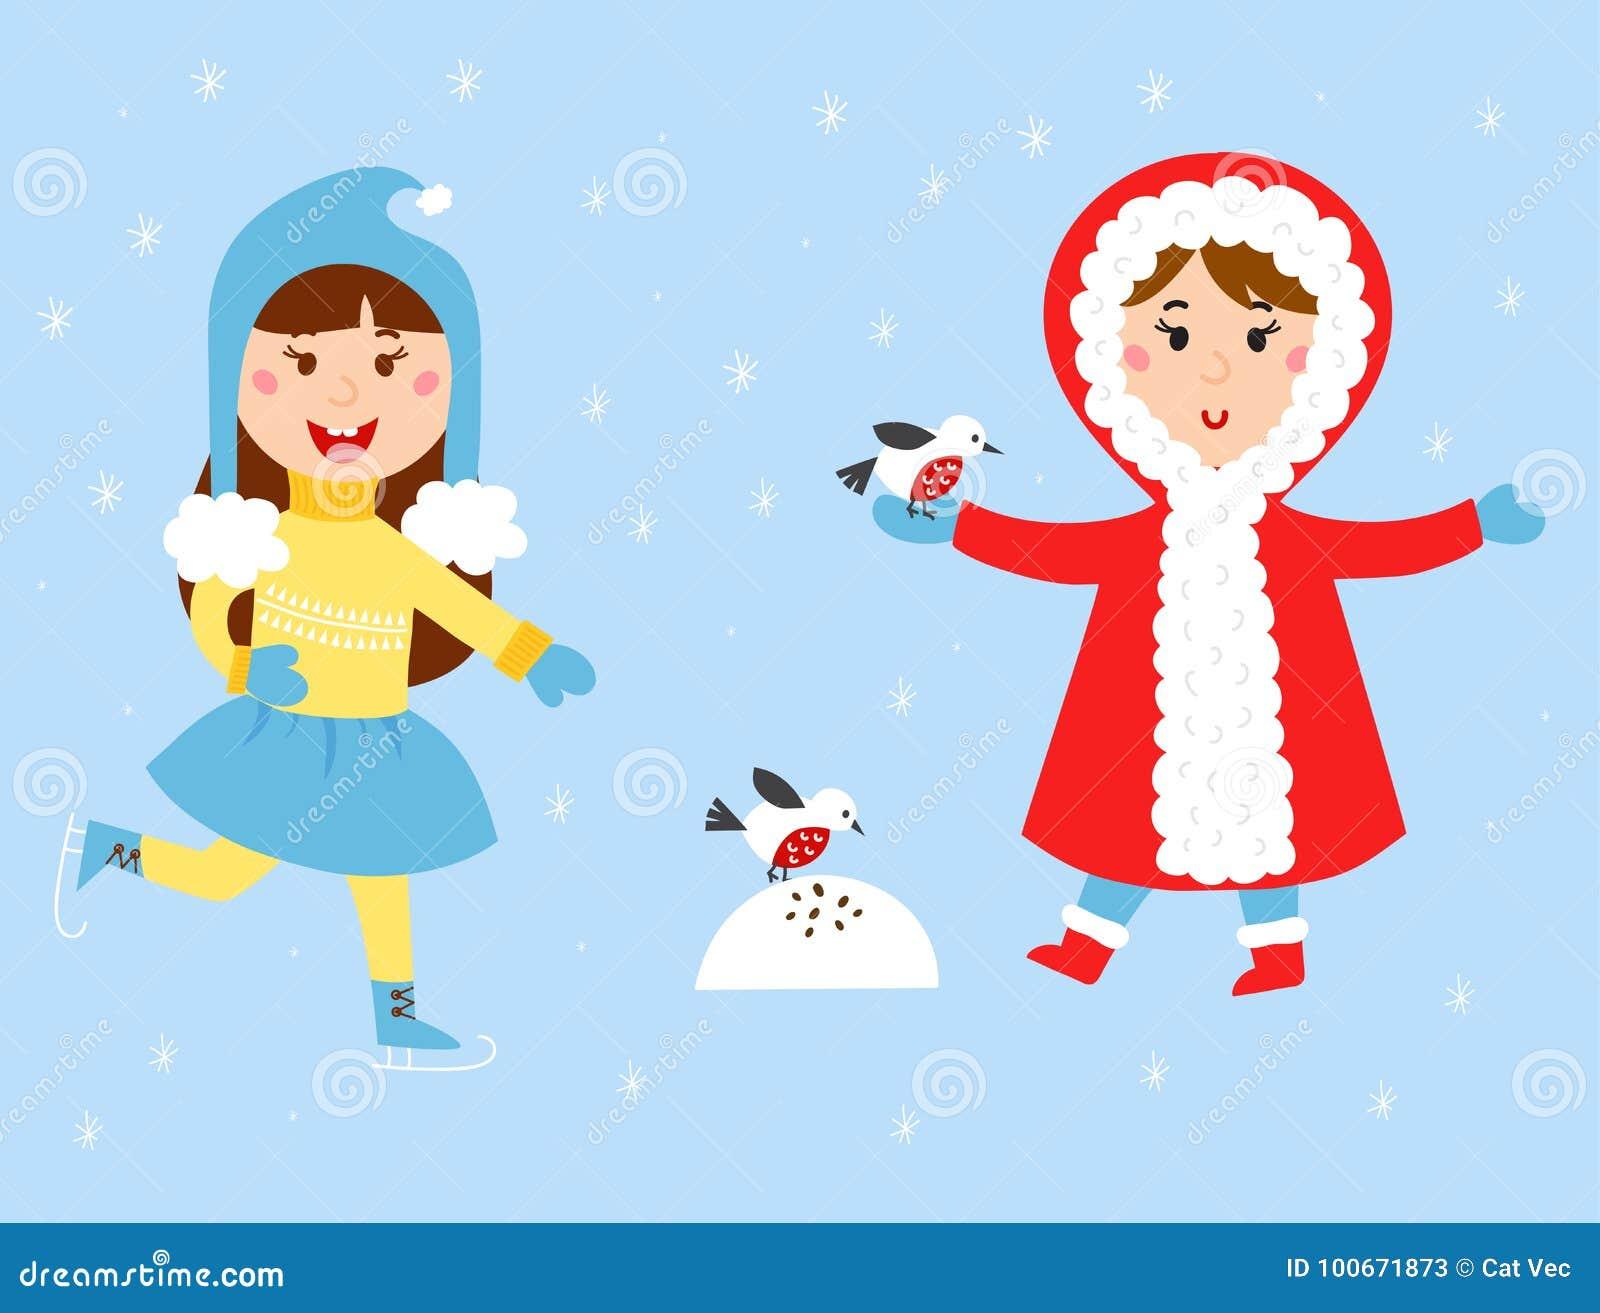 Christmas Snowballs